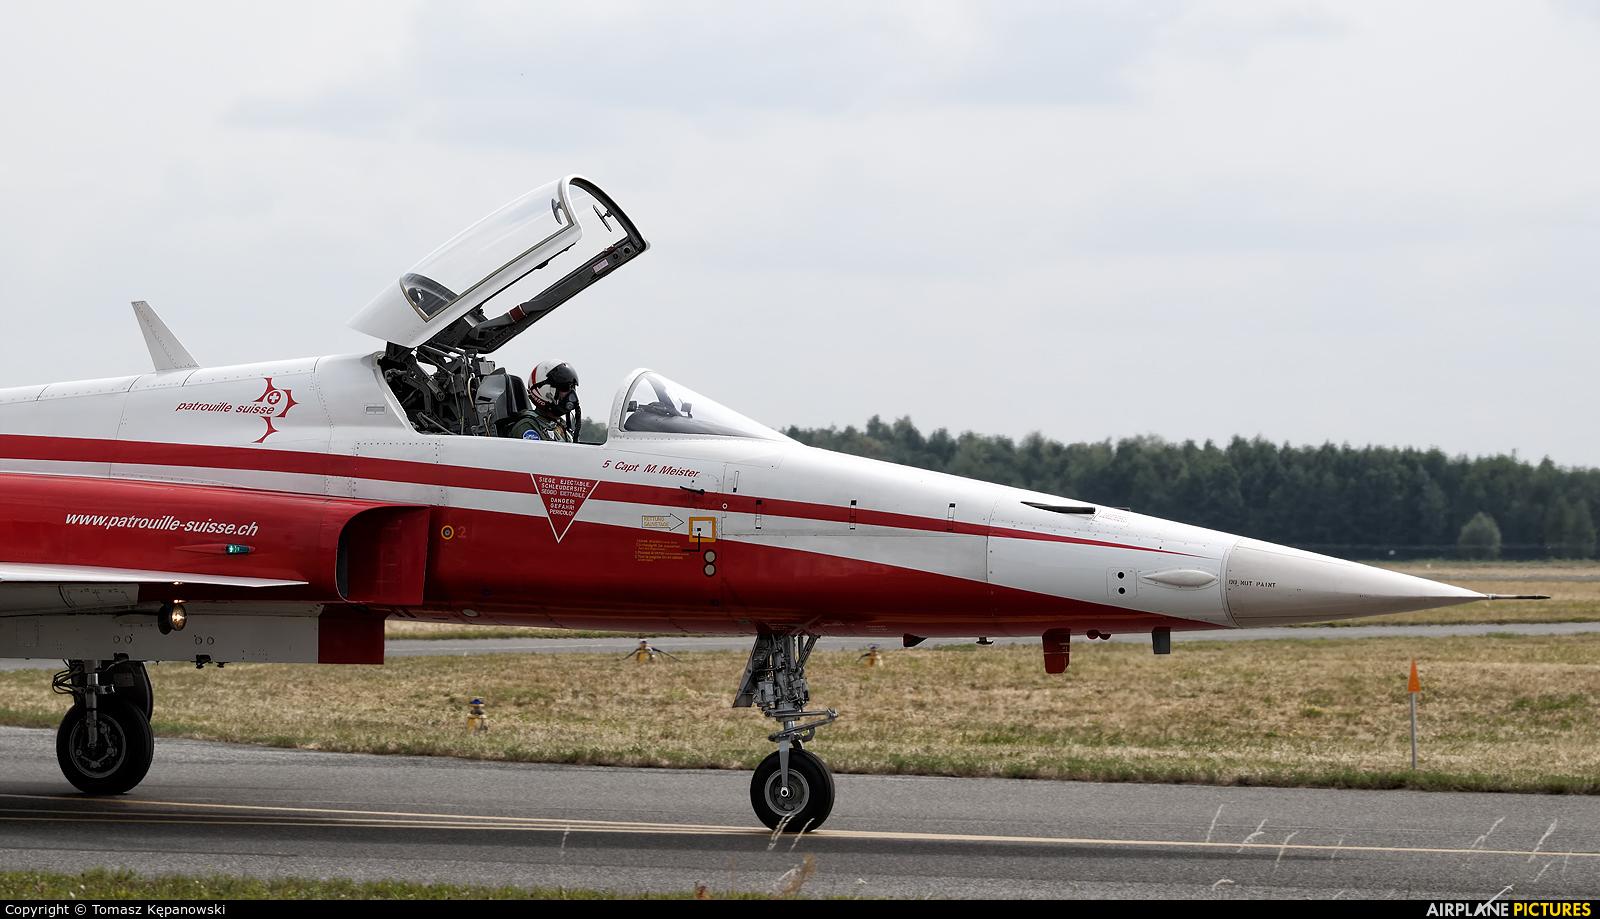 Switzerland - Air Force:  Patrouille de Suisse J-3080 aircraft at Radom - Sadków